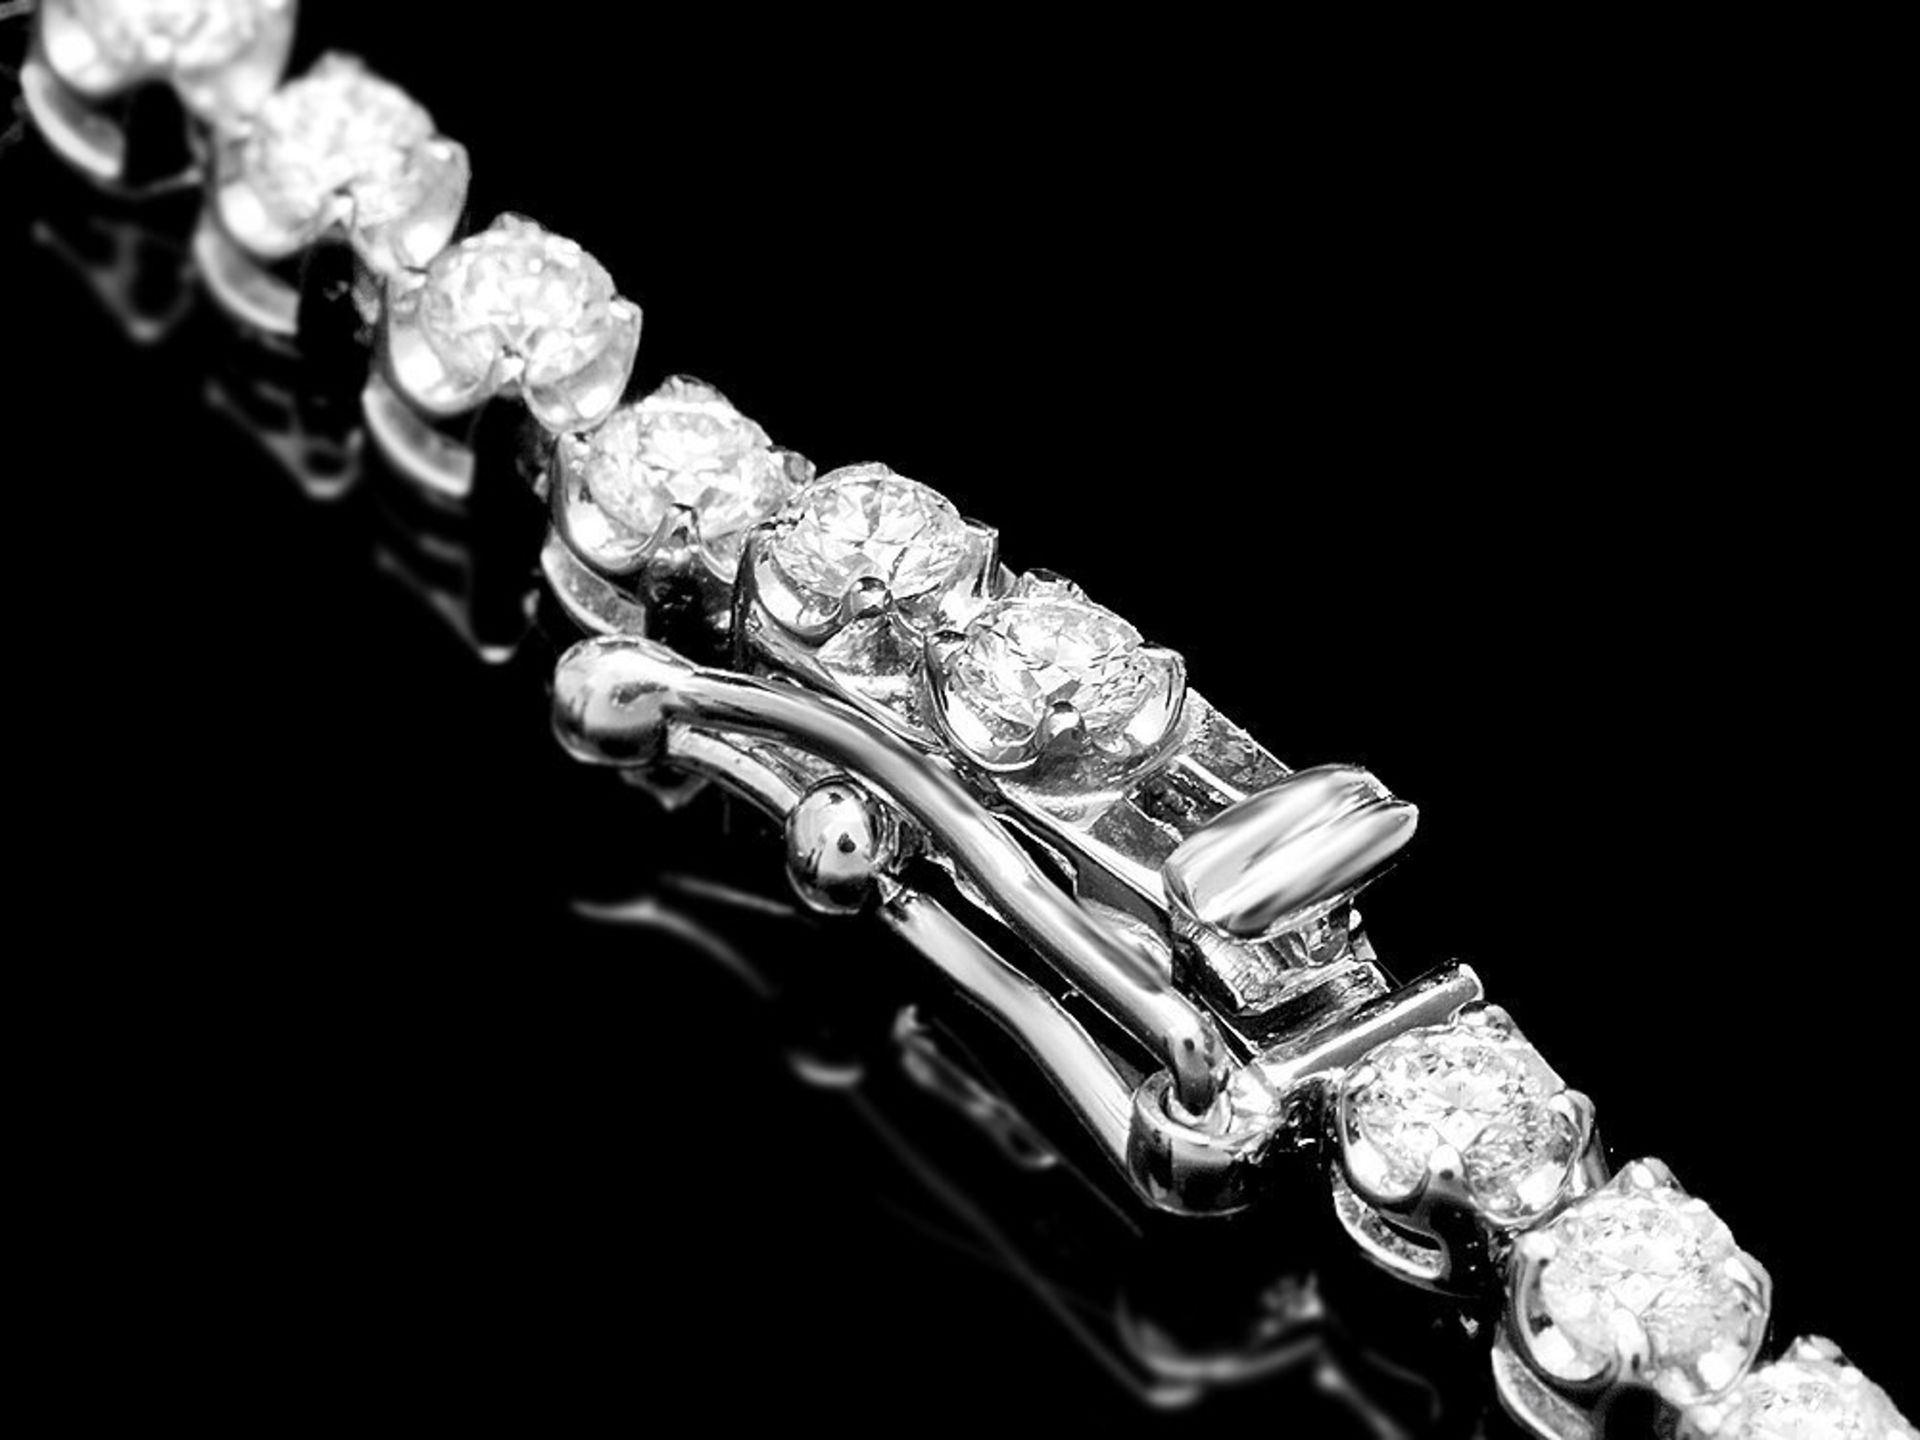 18k White Gold 7.00ct Diamond Necklace - Image 2 of 3